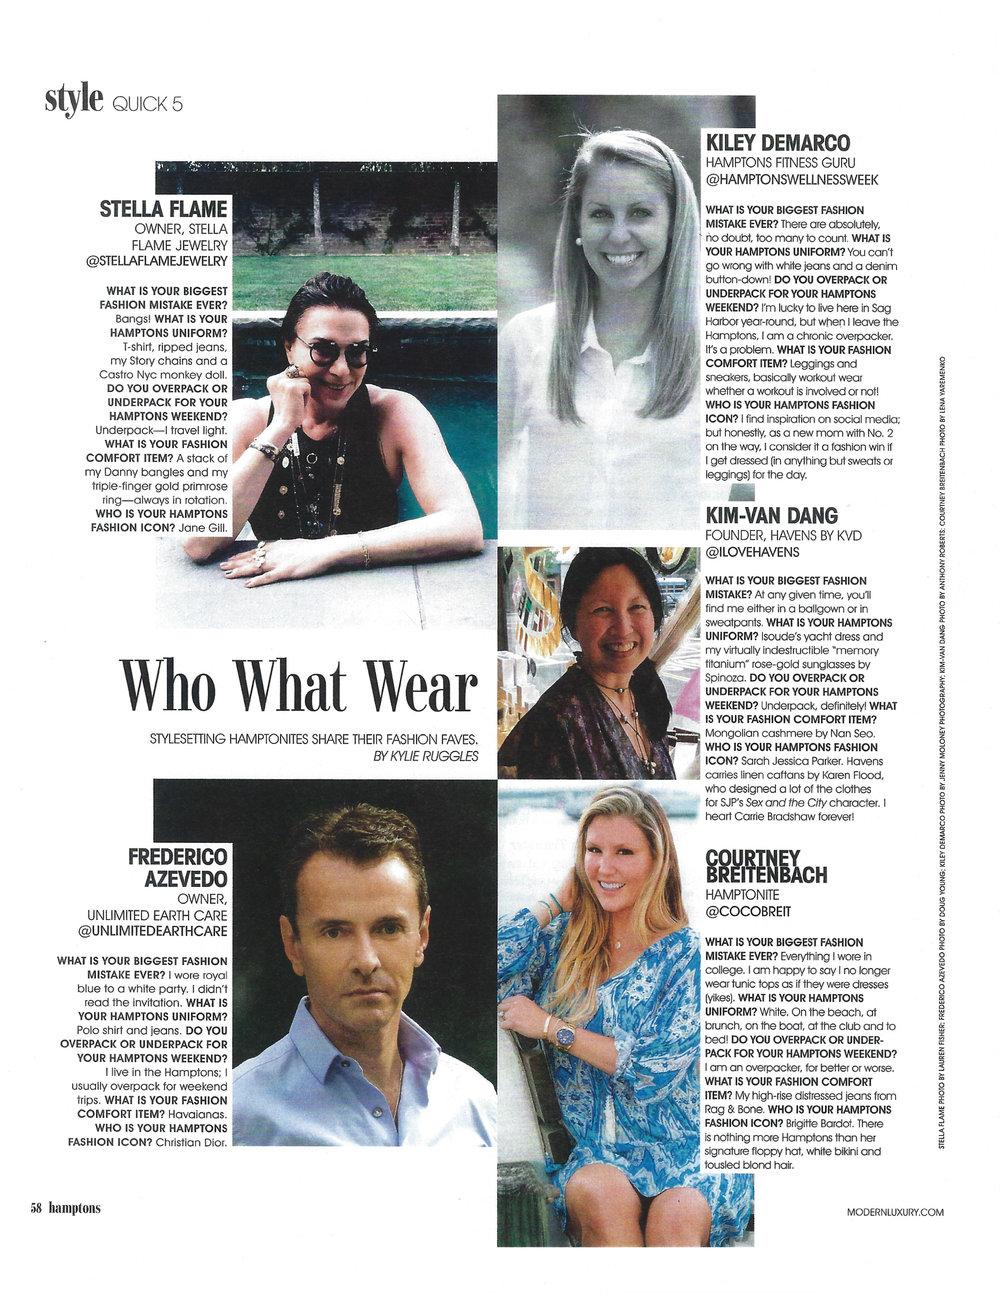 Modern Luxury Hamptons_August 2018 1.jpg